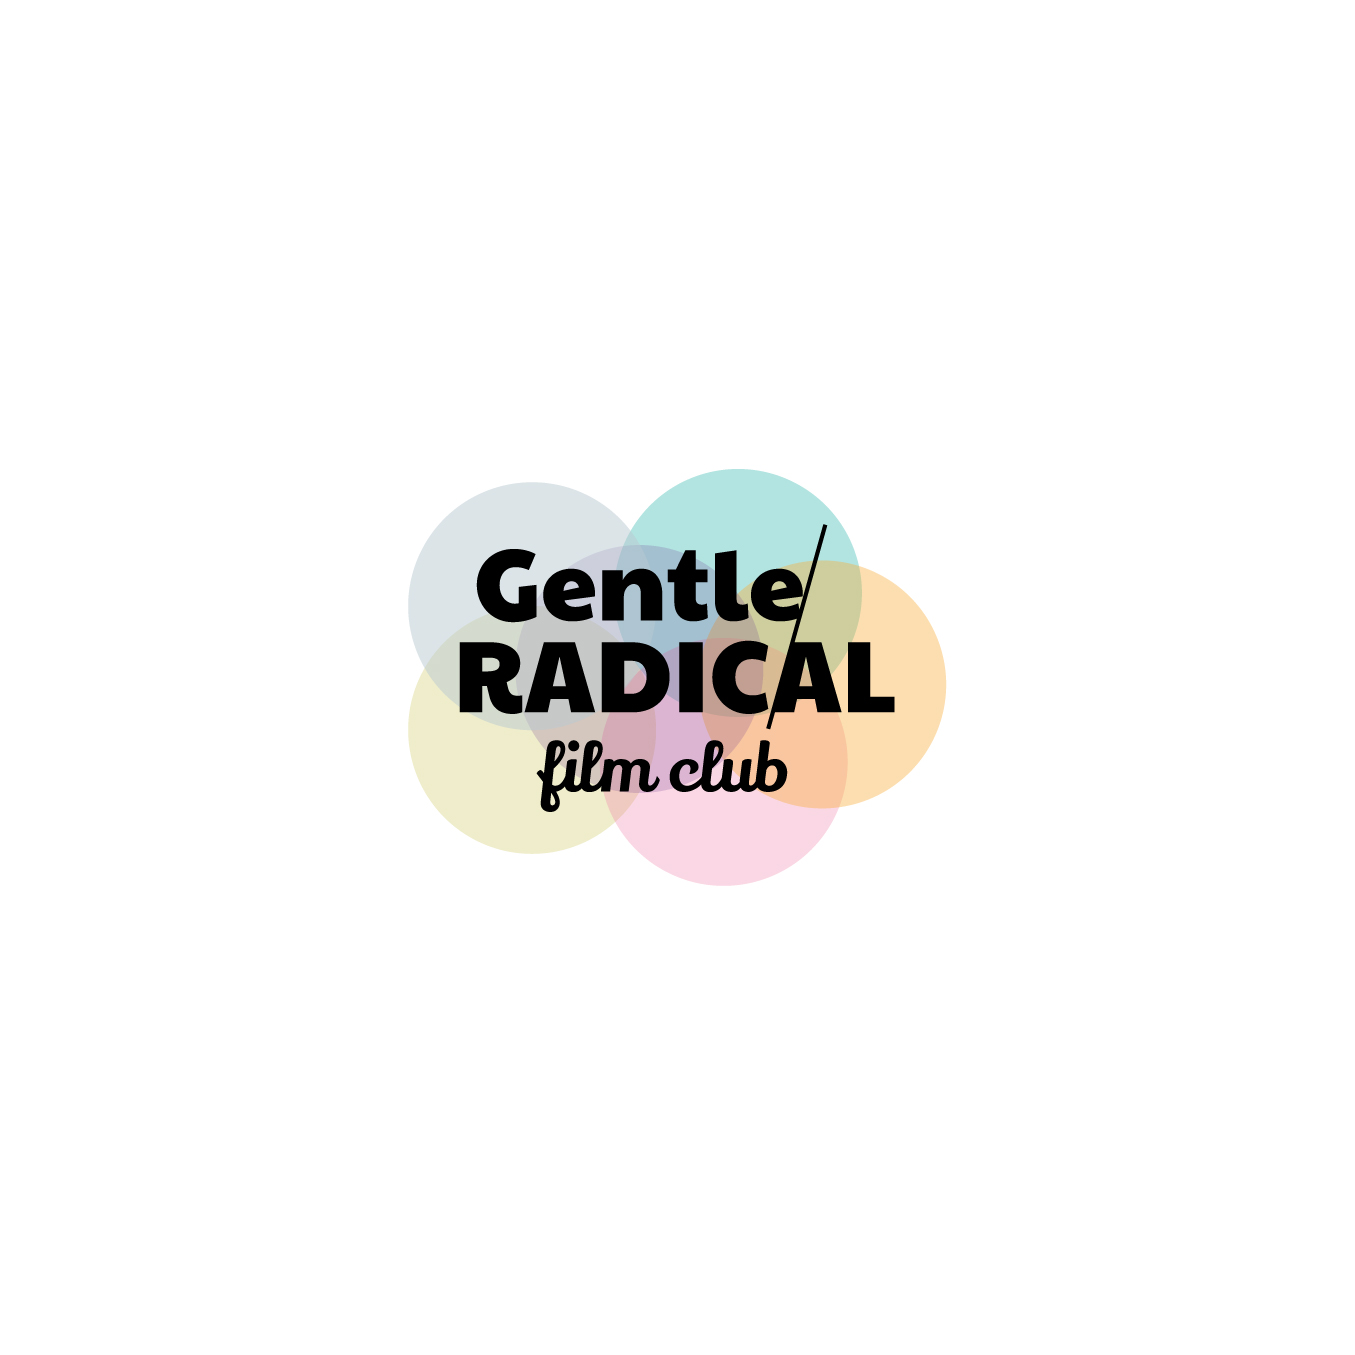 portfolio_GentleRadicalFilmClub.jpg